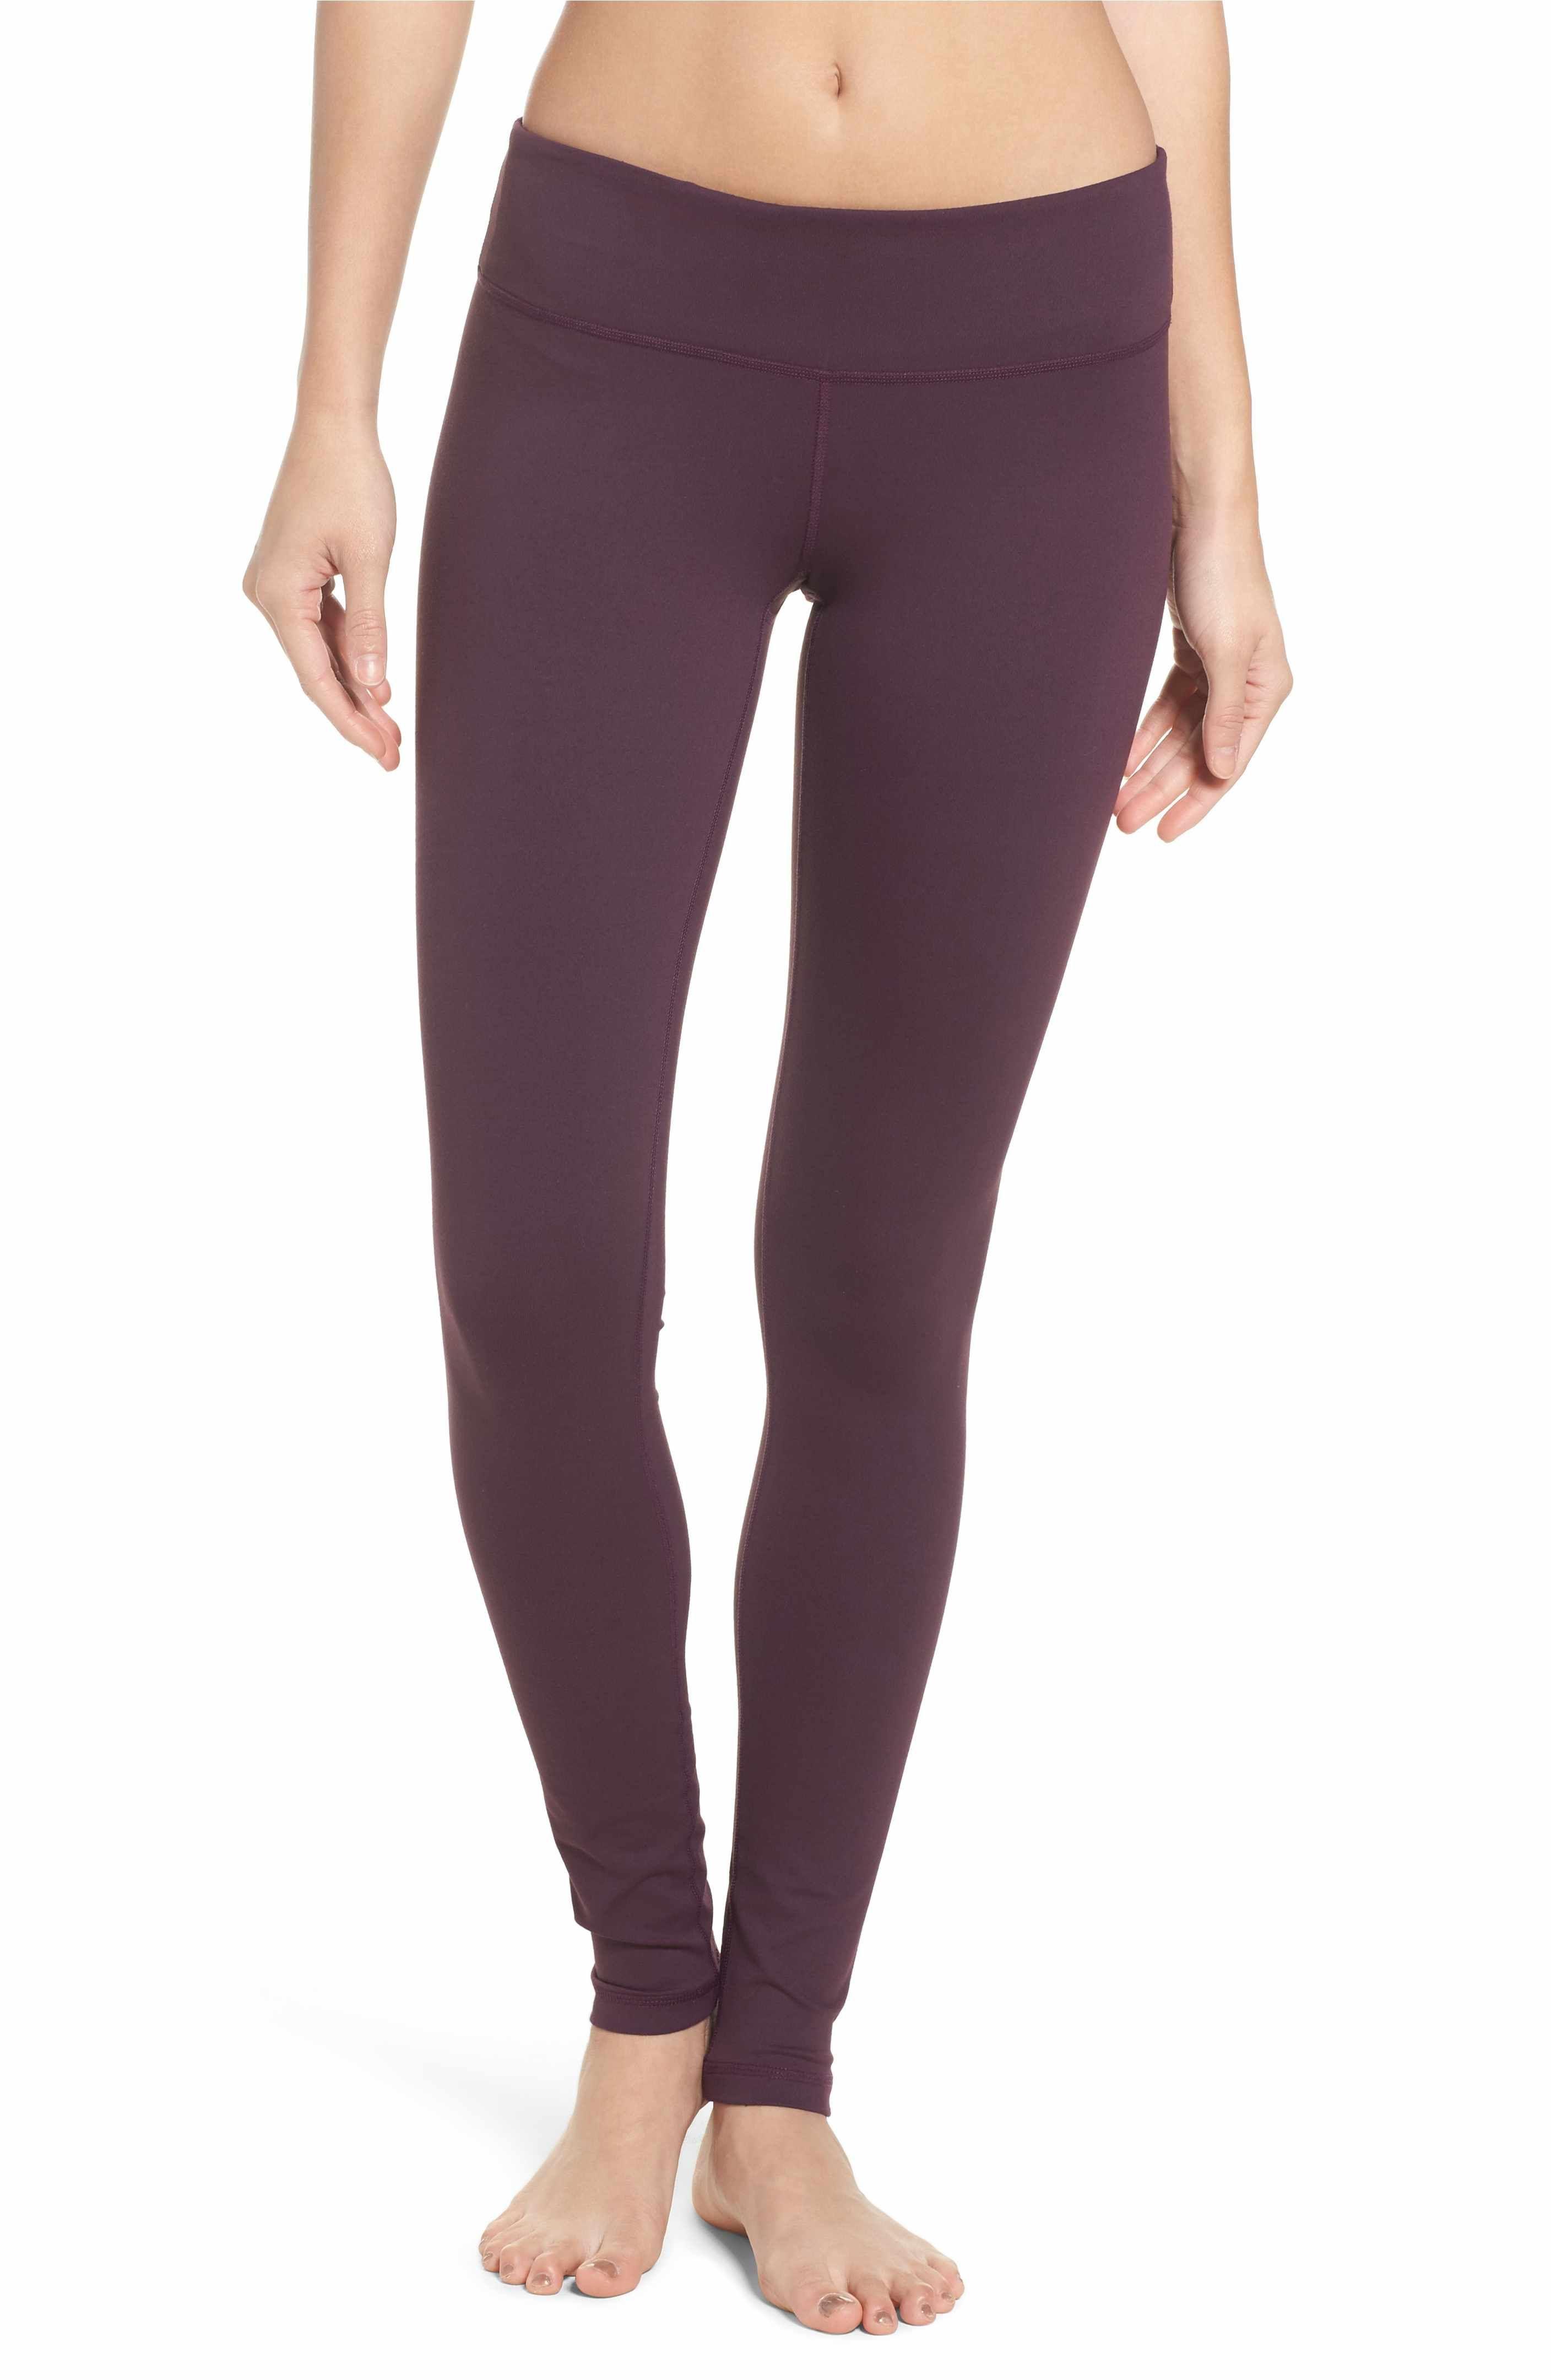 1d8545a13bb2f Zella Live In Slim Fit Leggings - Purple Plum | Fitness Fashion ...